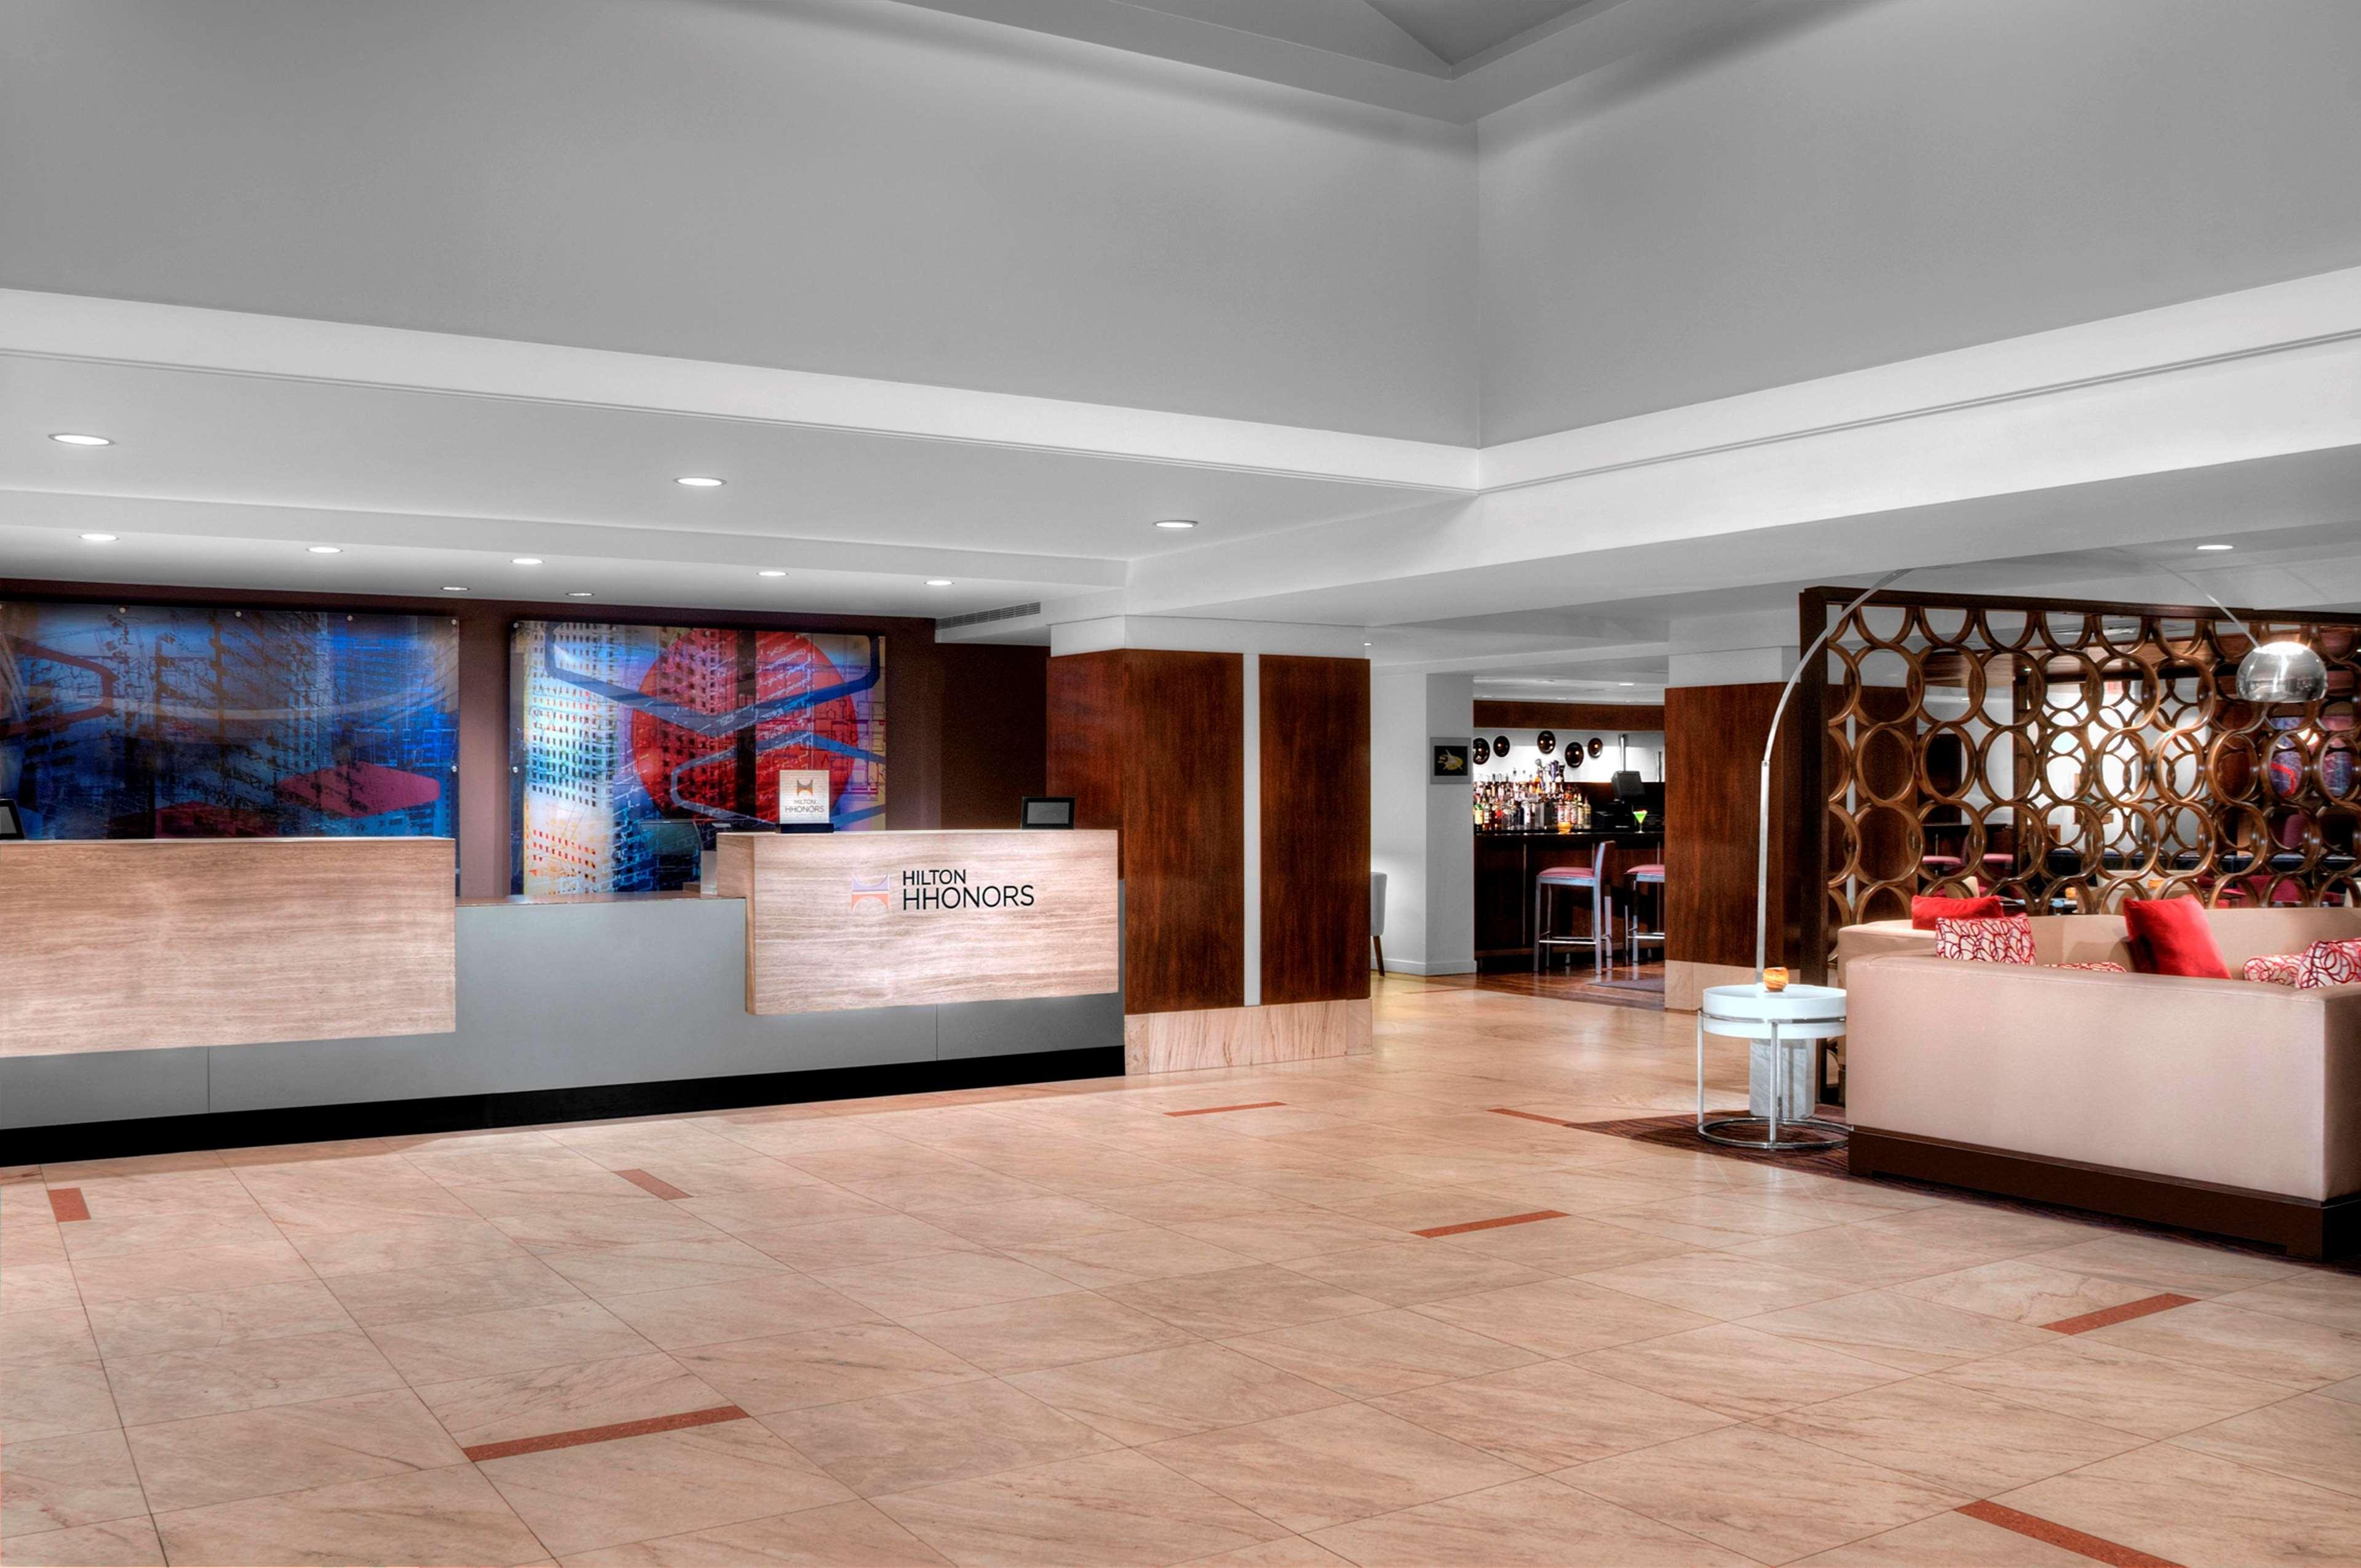 Doubletree By Hilton Hotel Metropolitan  Lexington Avenue